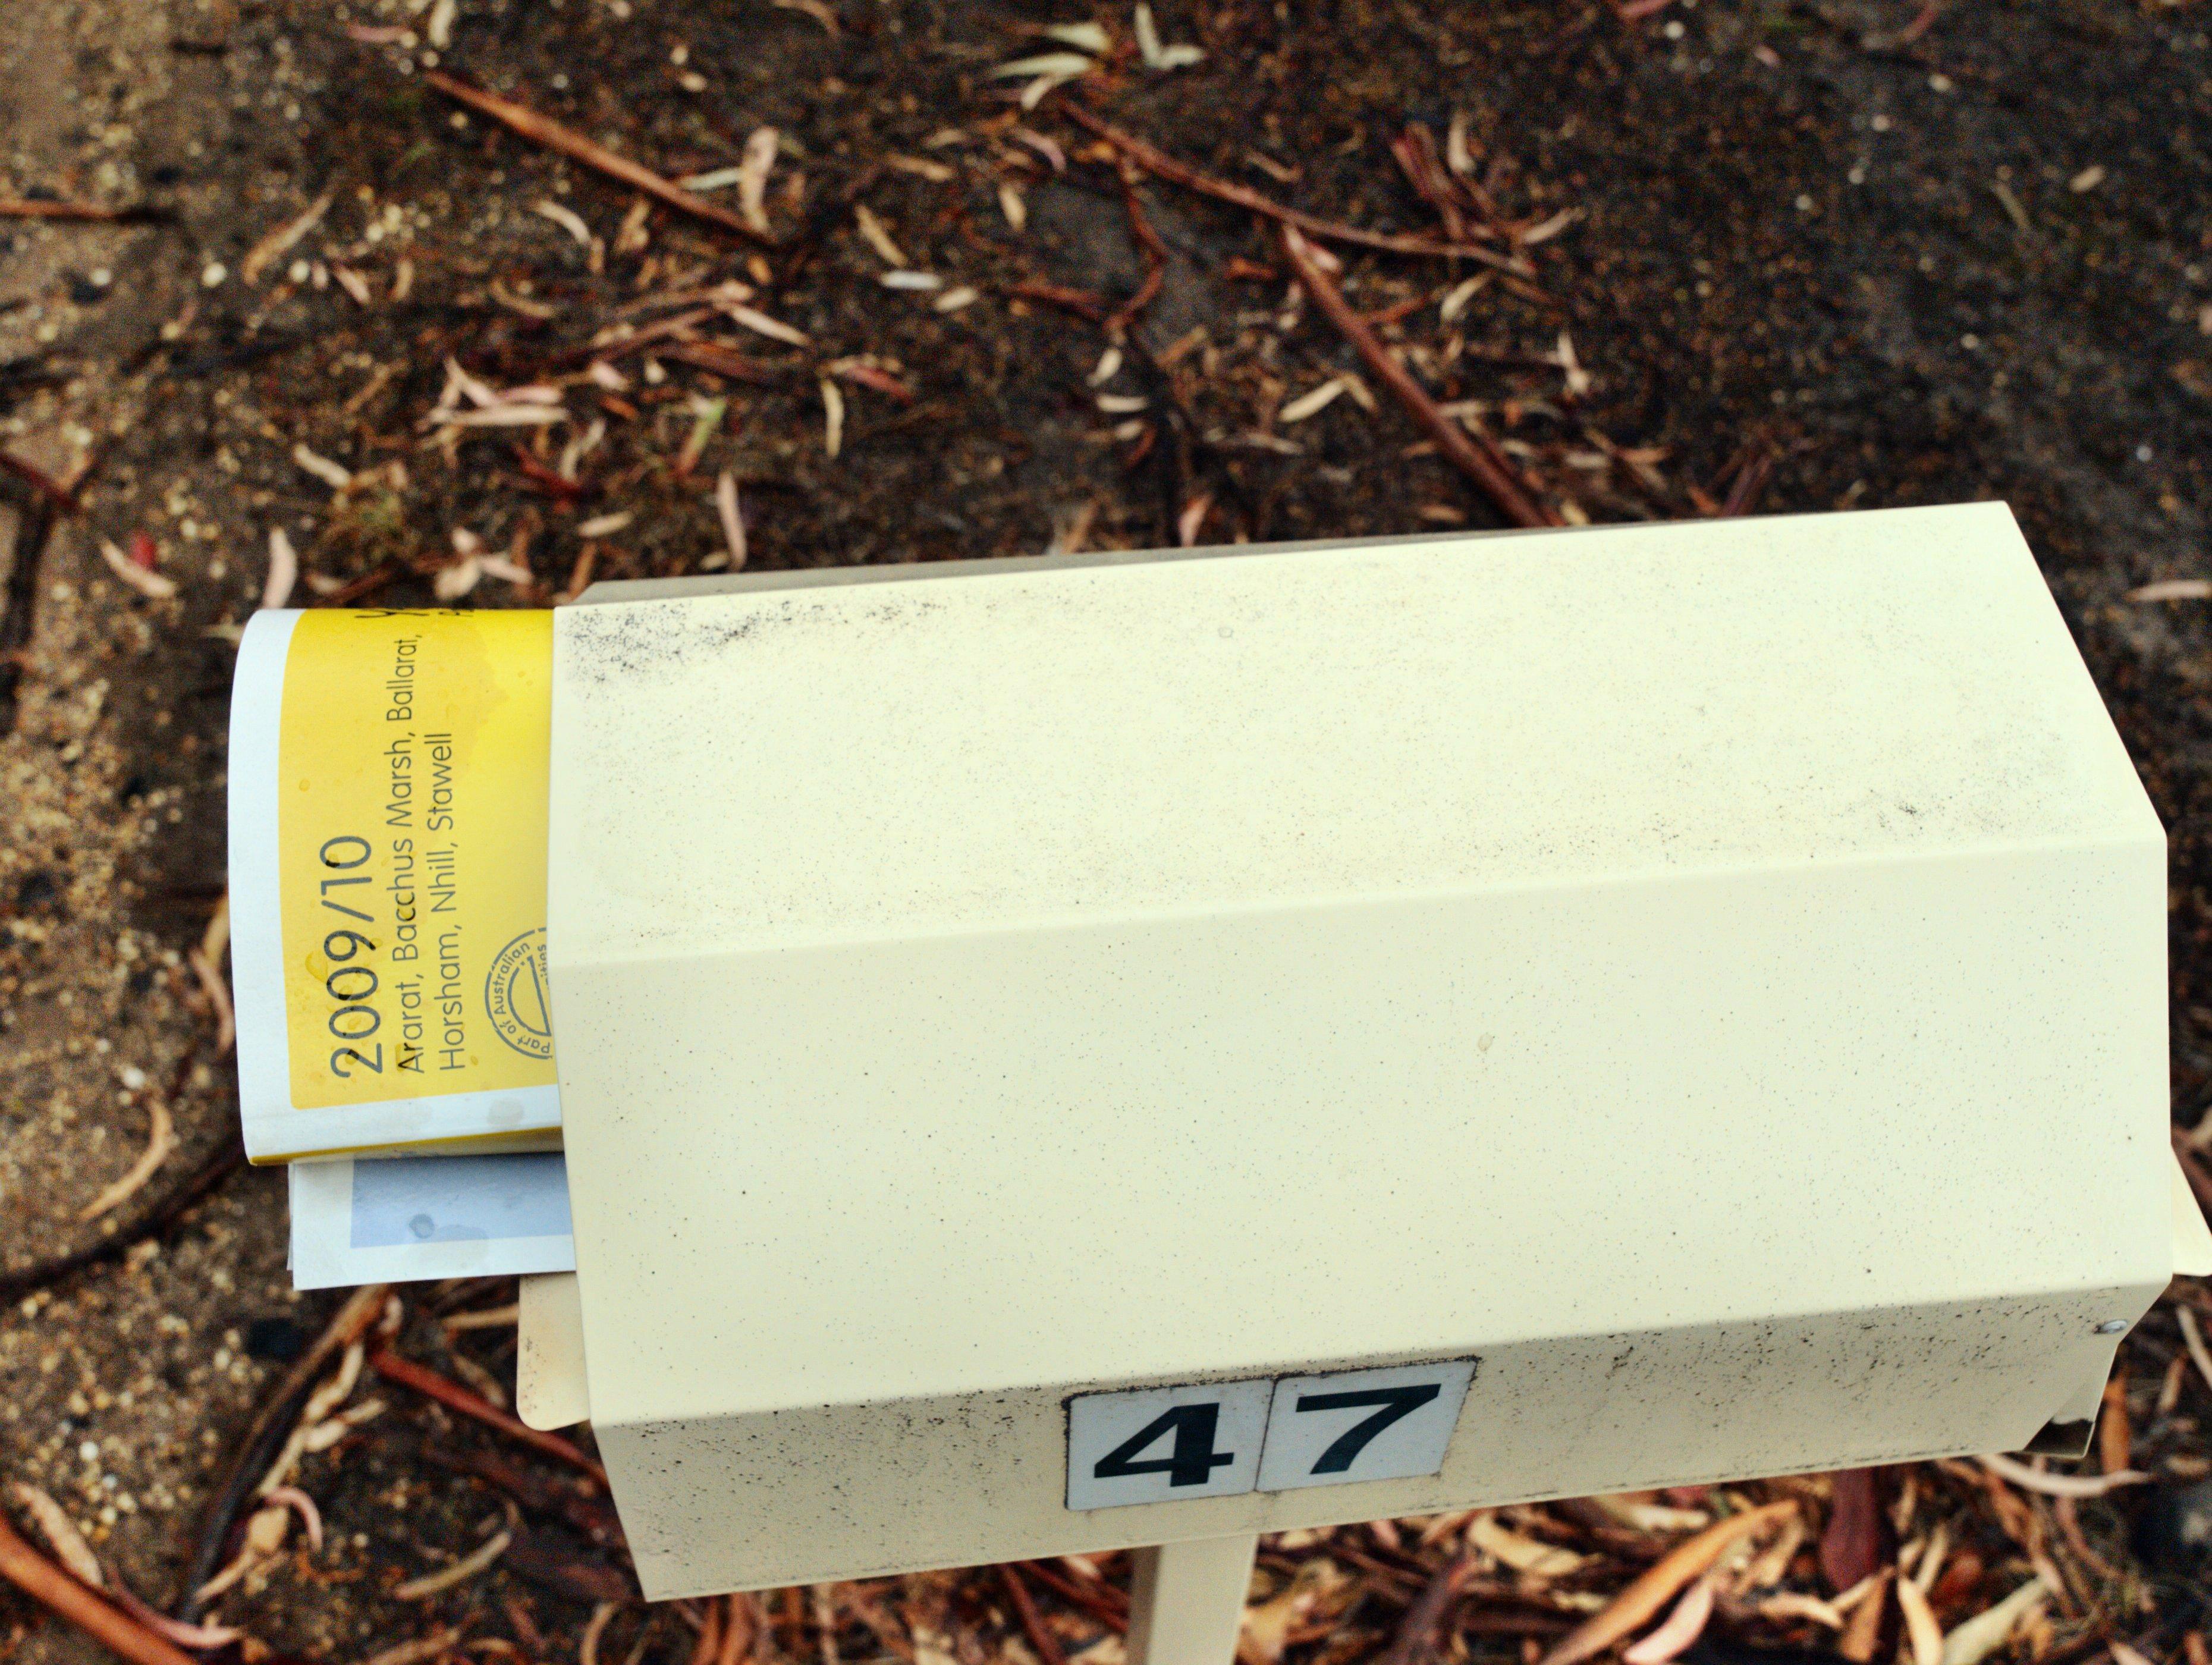 letterbox-1.jpeg